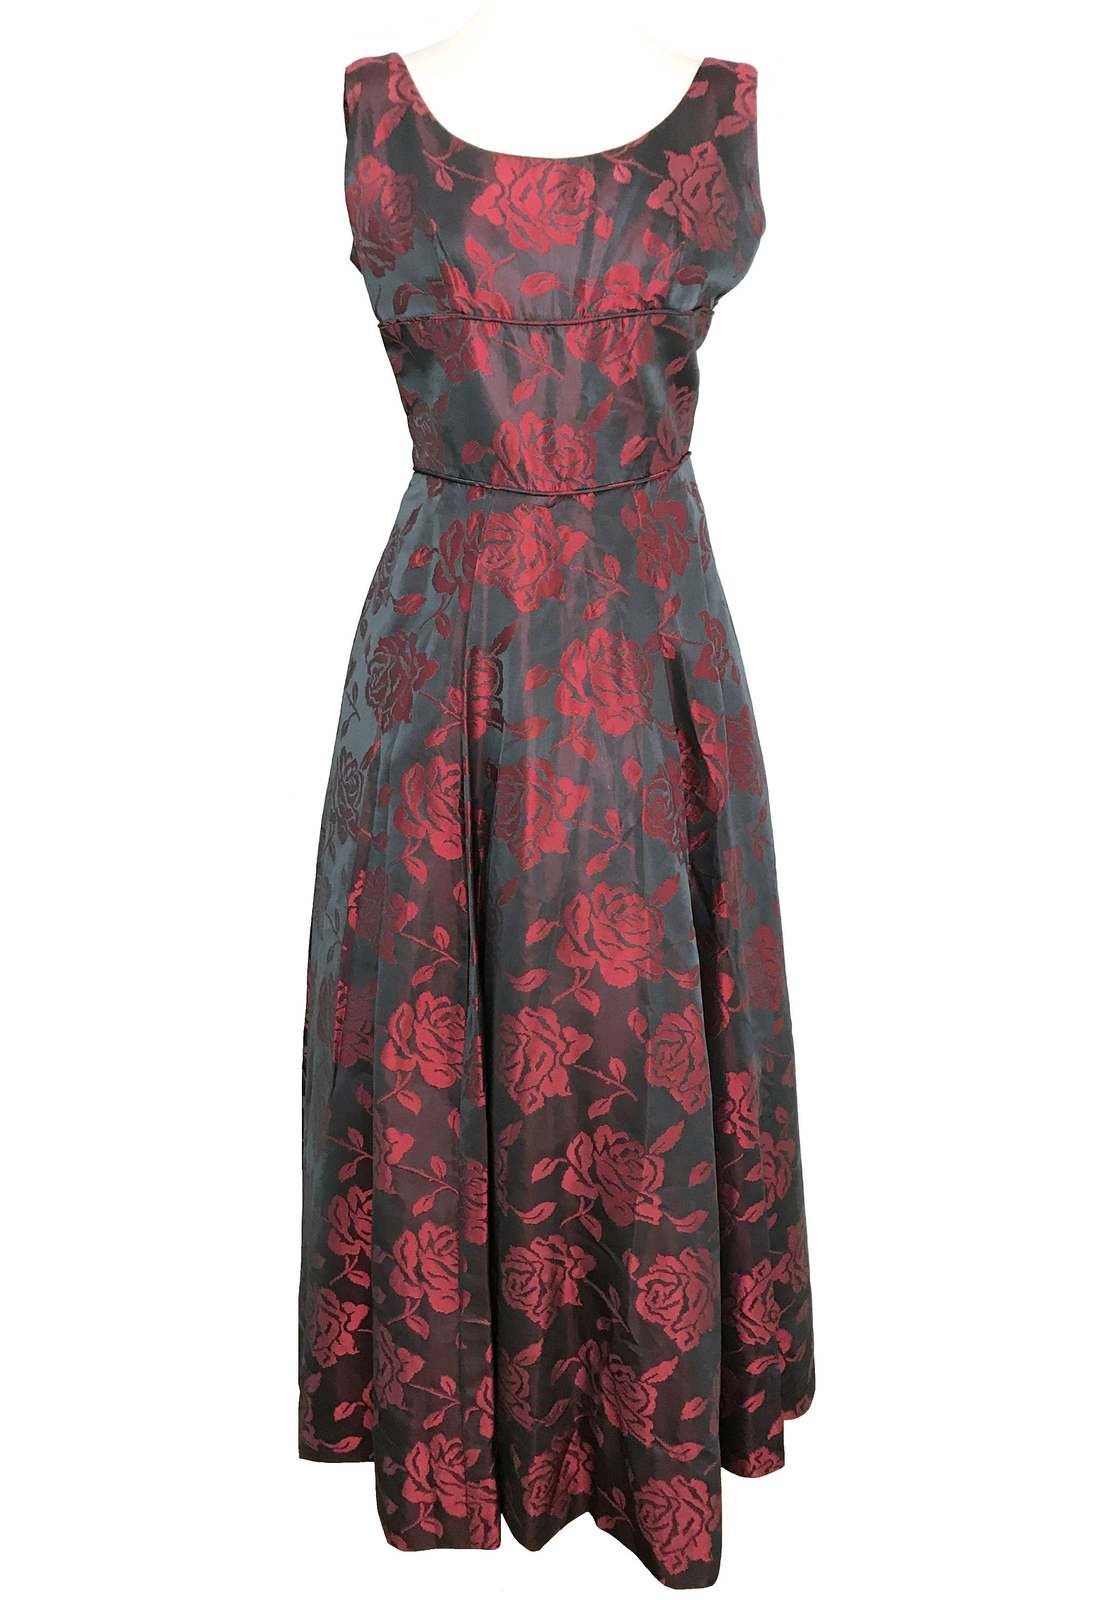 50s Iridescent Silk Jacquard Deep Grey Strawberry Pink Rose Pattern Ball Gown